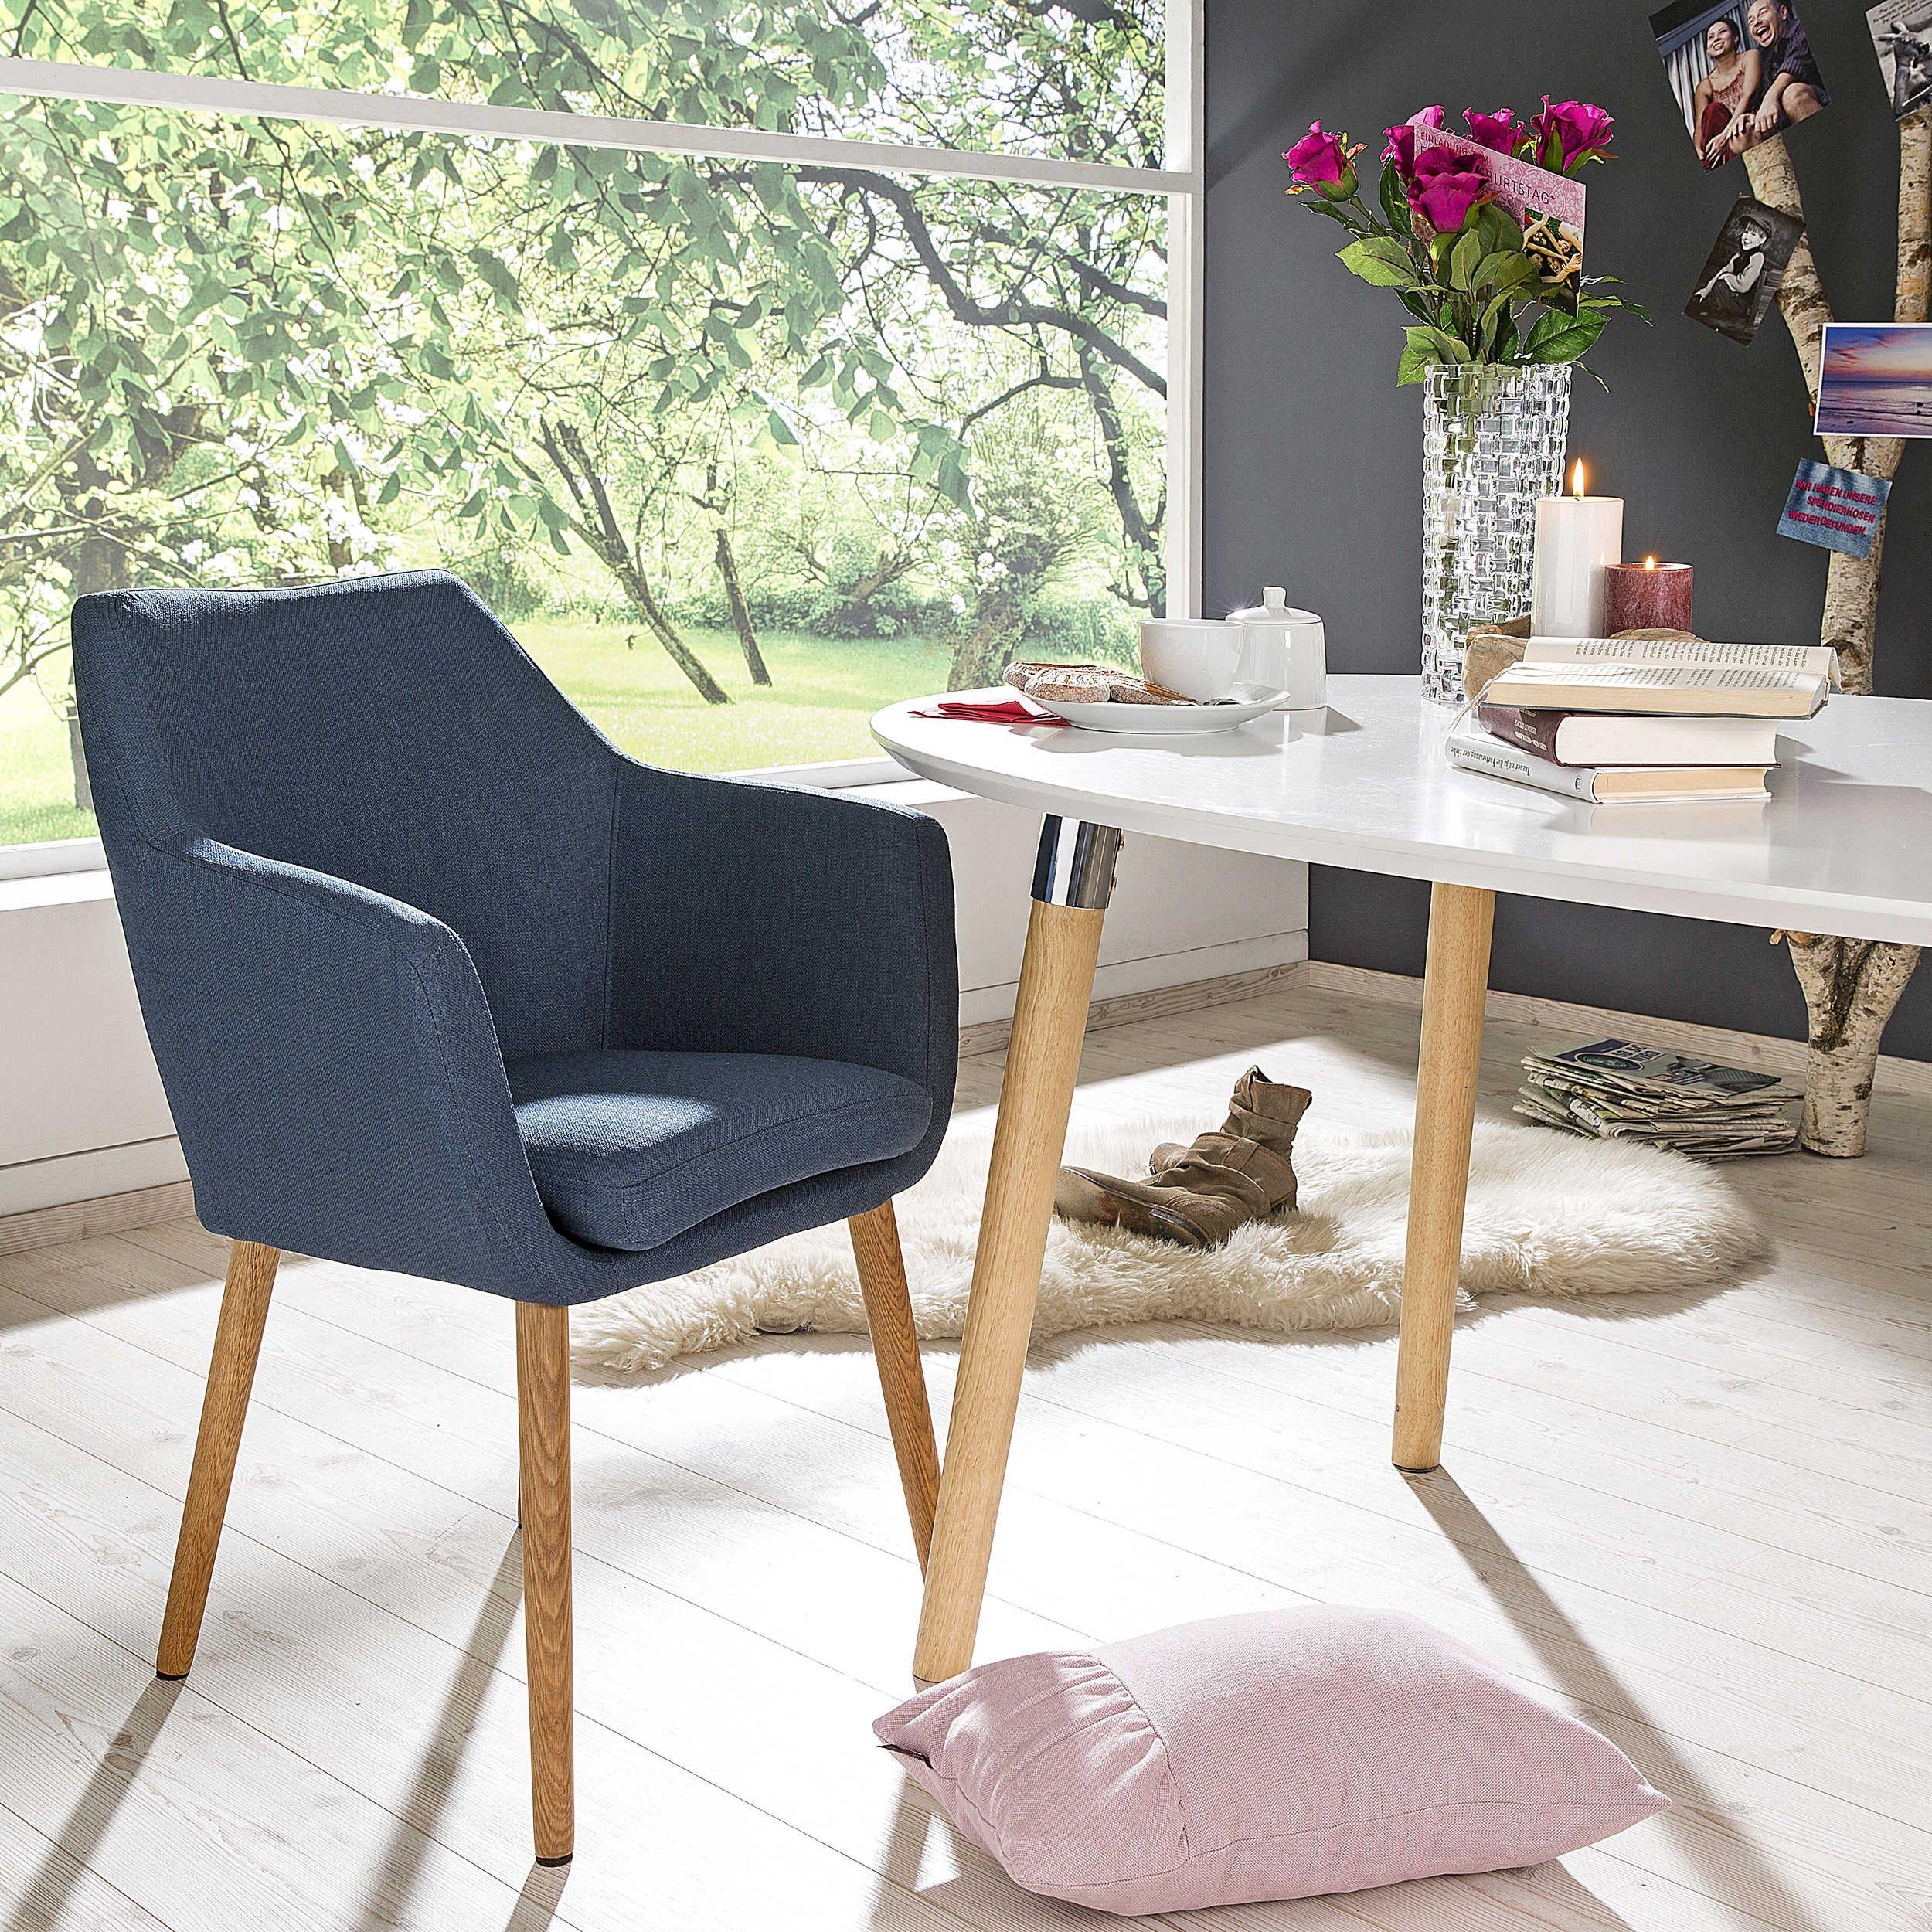 stuhl petrulli, hellgrau - 4 fuß stühle - stühle & freischwinger